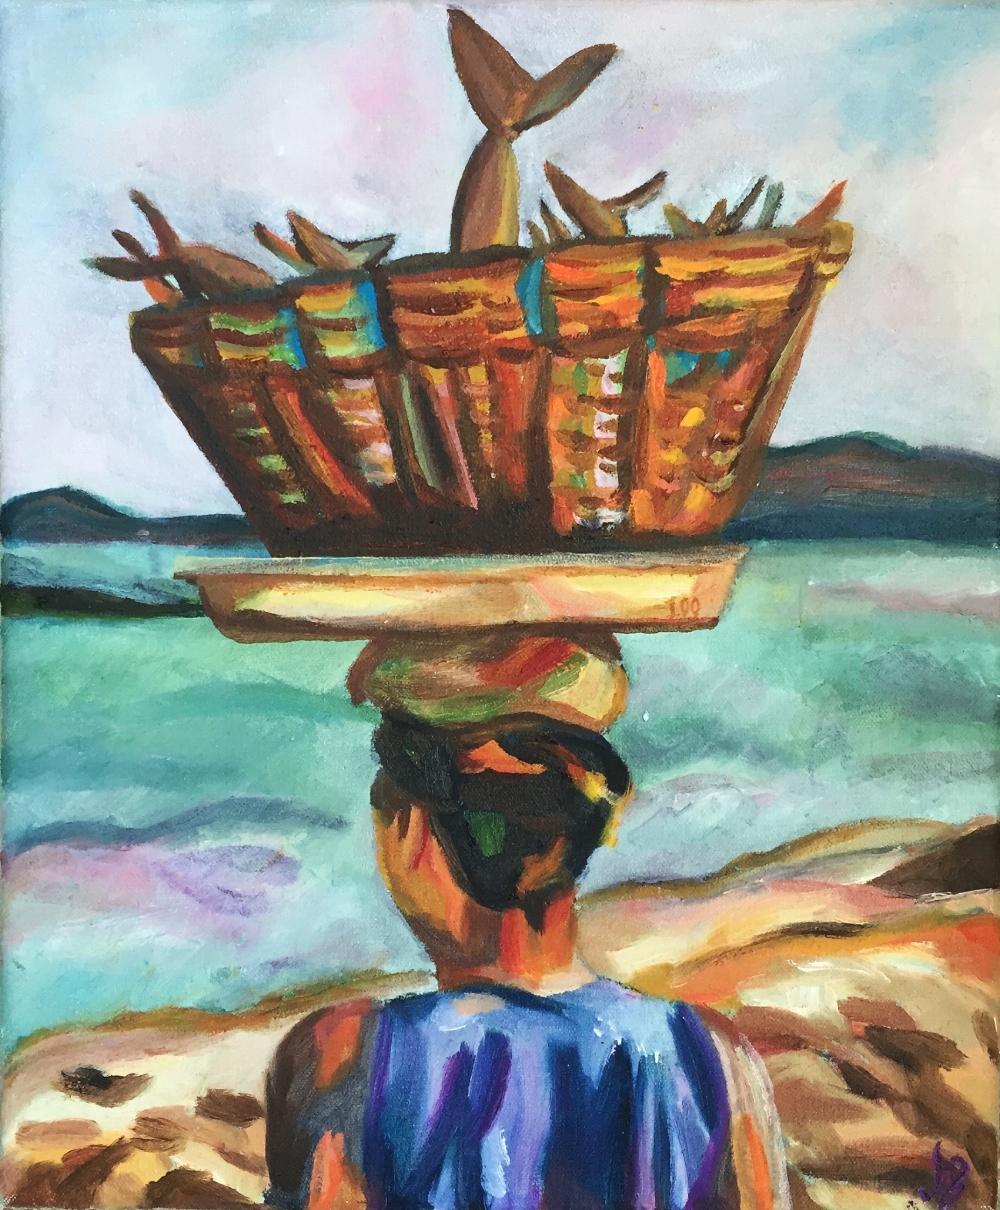 My Sea | Oil on canvas | 2015